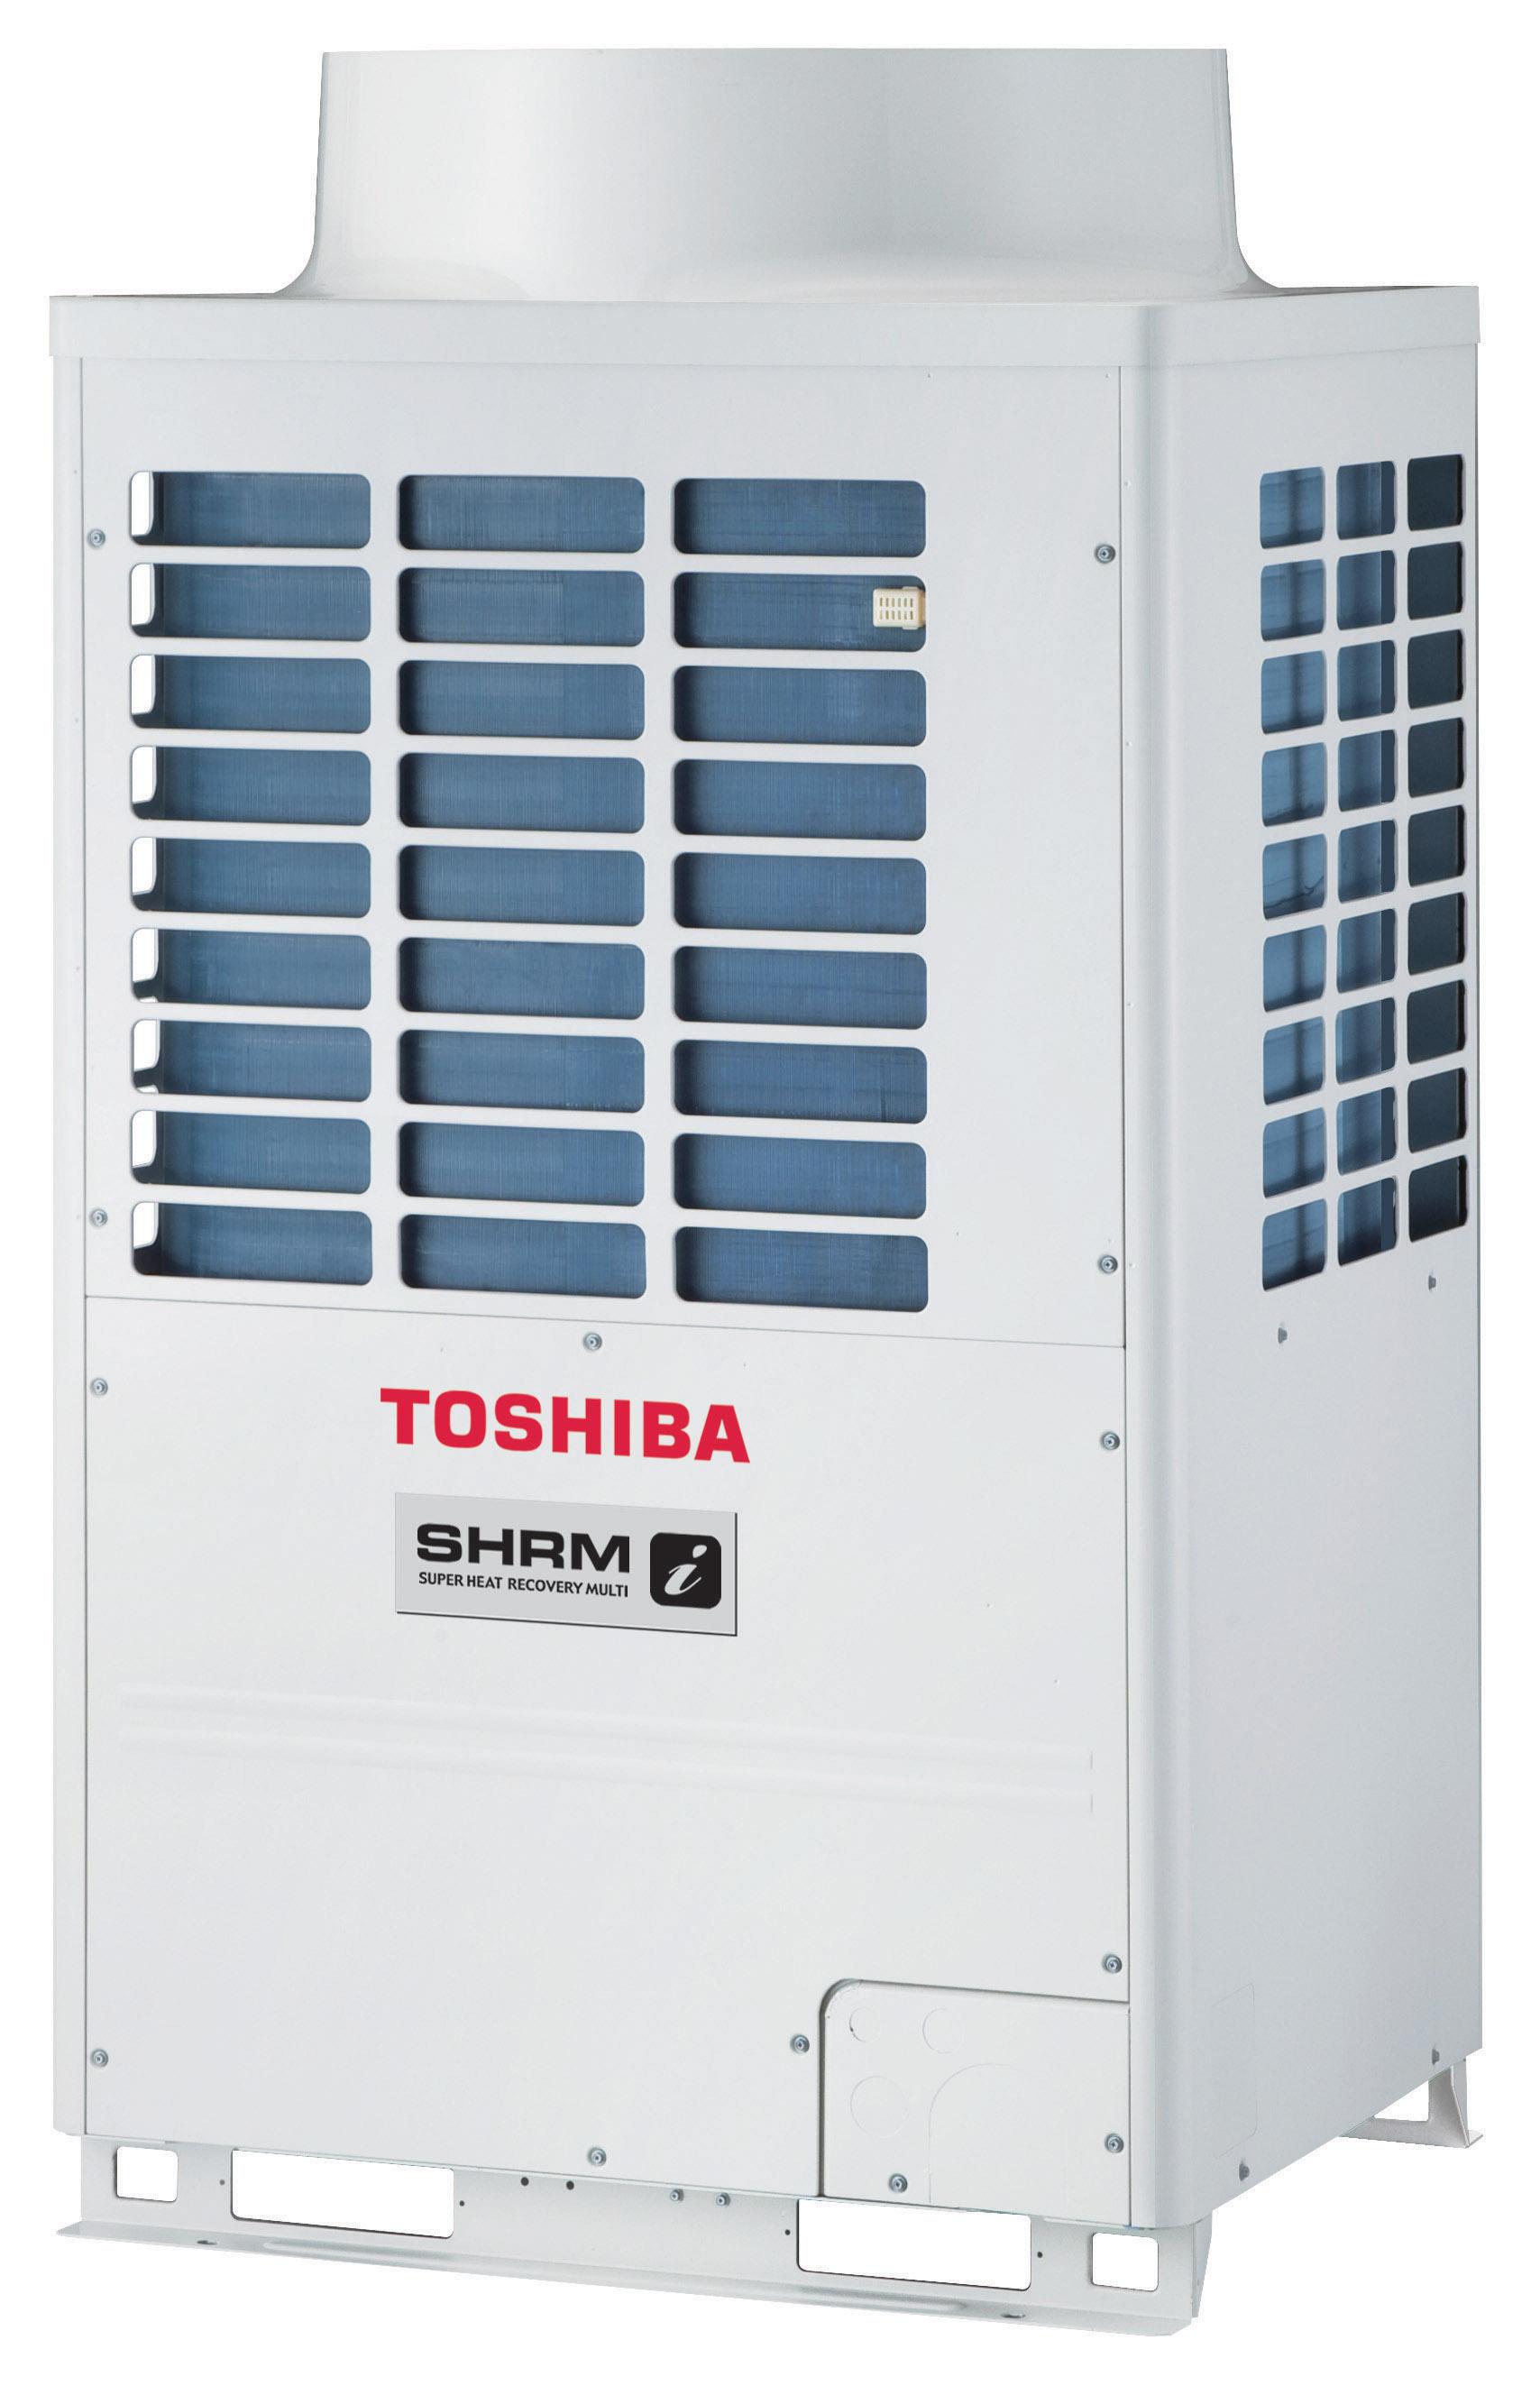 Toshiba Vrf Manuals G7 Asd Wiring Diagram Carrier Indoor Units Array News U2014 English Rh Toshibacca Com